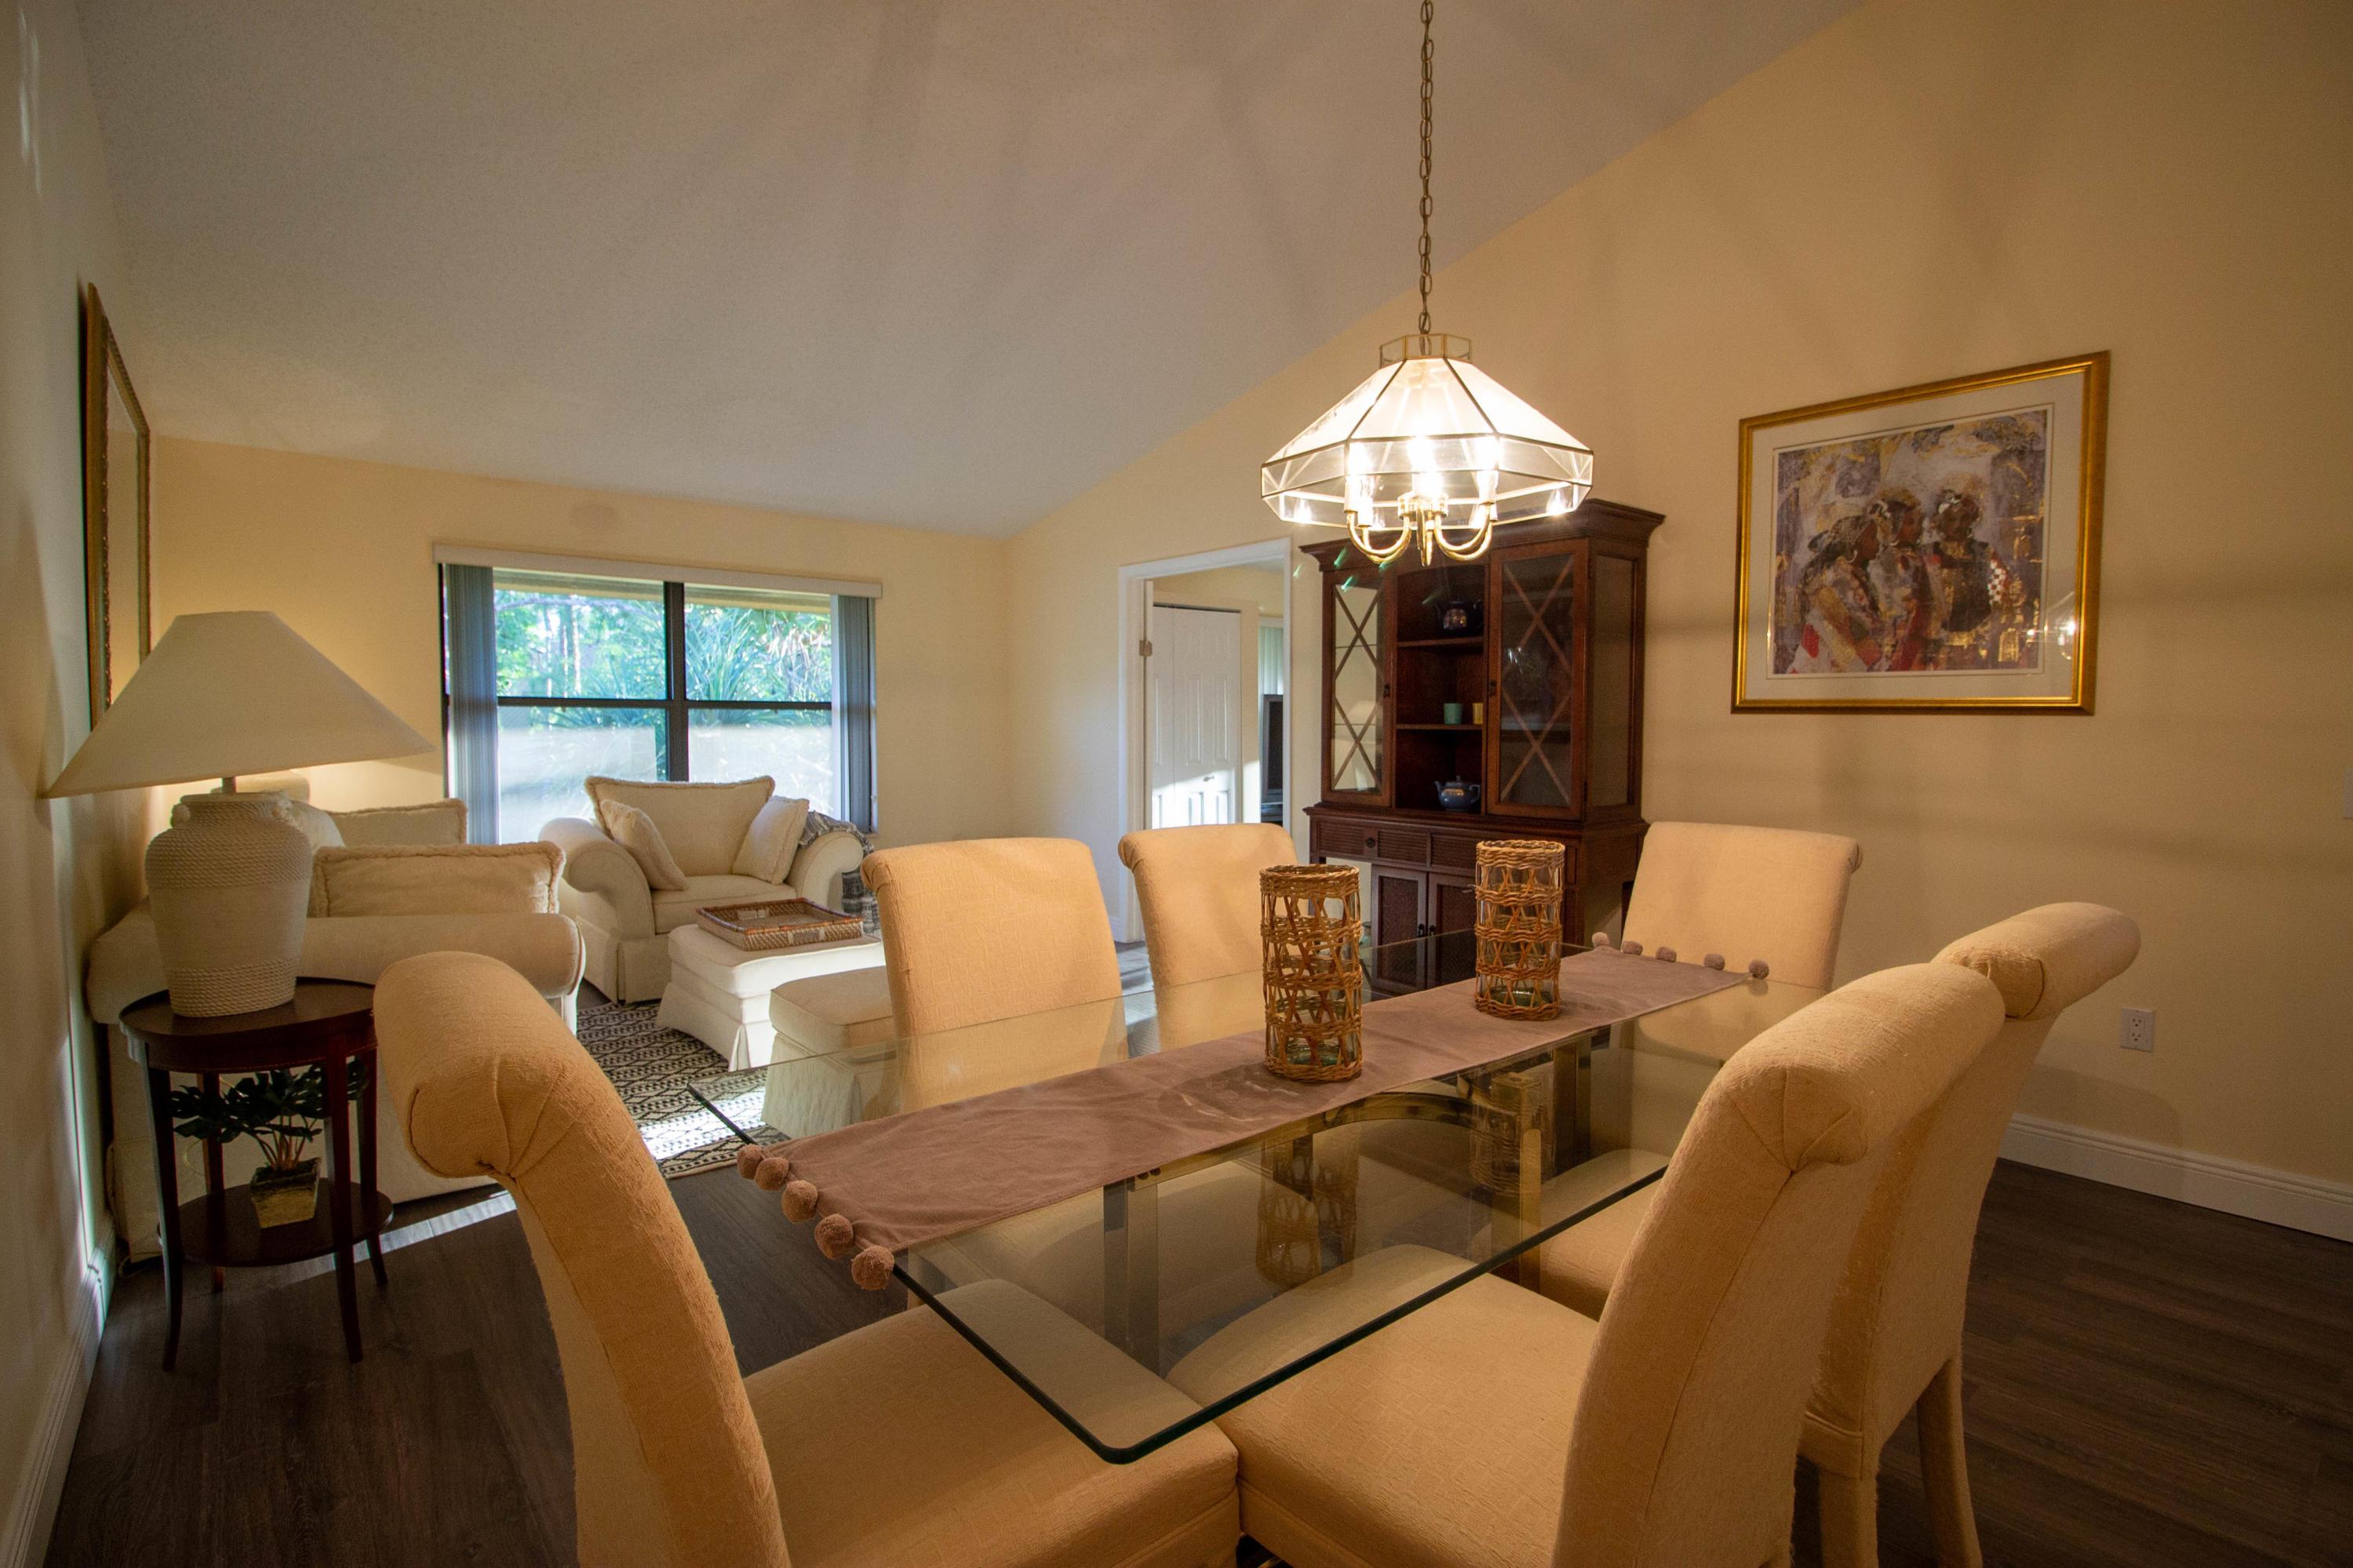 13035 Albright Court, Wellington, Florida 33414, 3 Bedrooms Bedrooms, ,2 BathroomsBathrooms,Condo/Coop,For Rent,Albright,2,RX-10532664